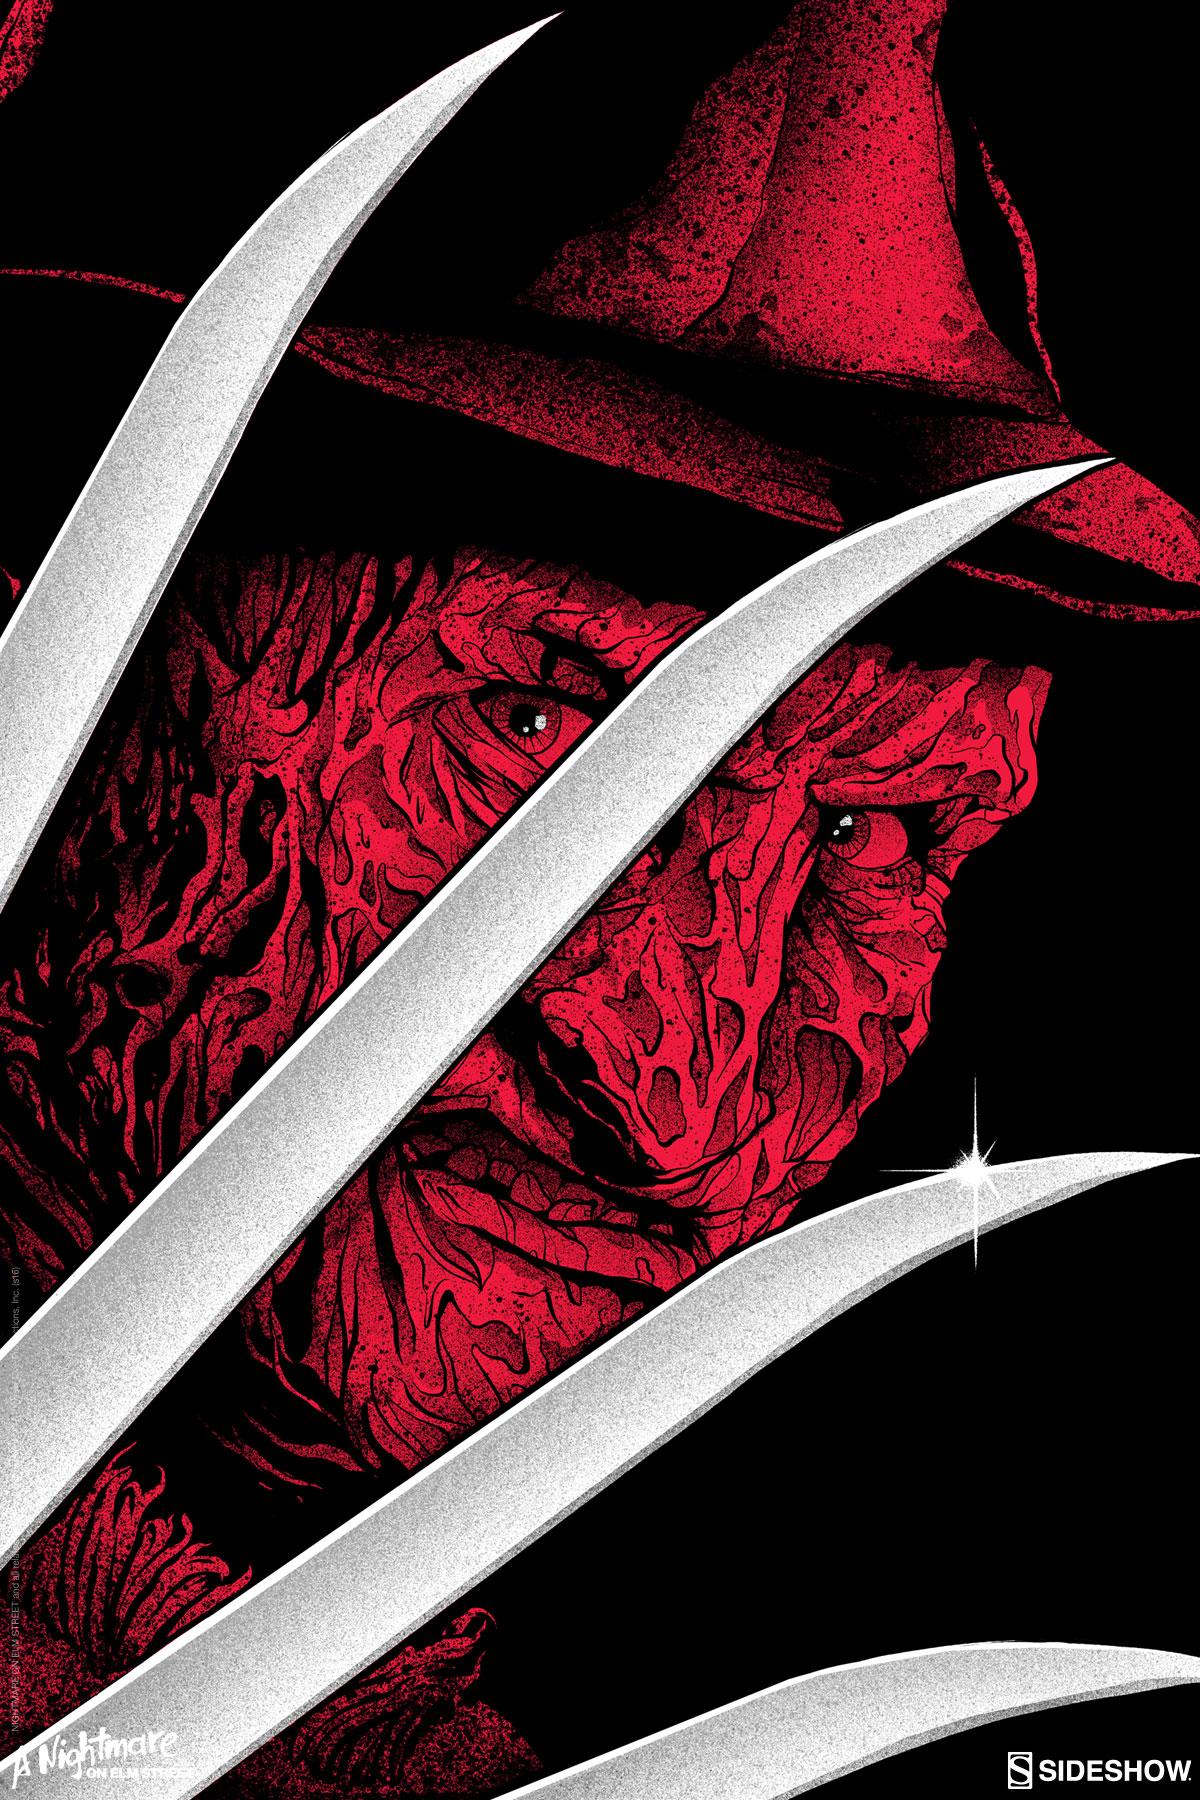 Freddy Krueger Screen-Print by Matt Ryan Tobin